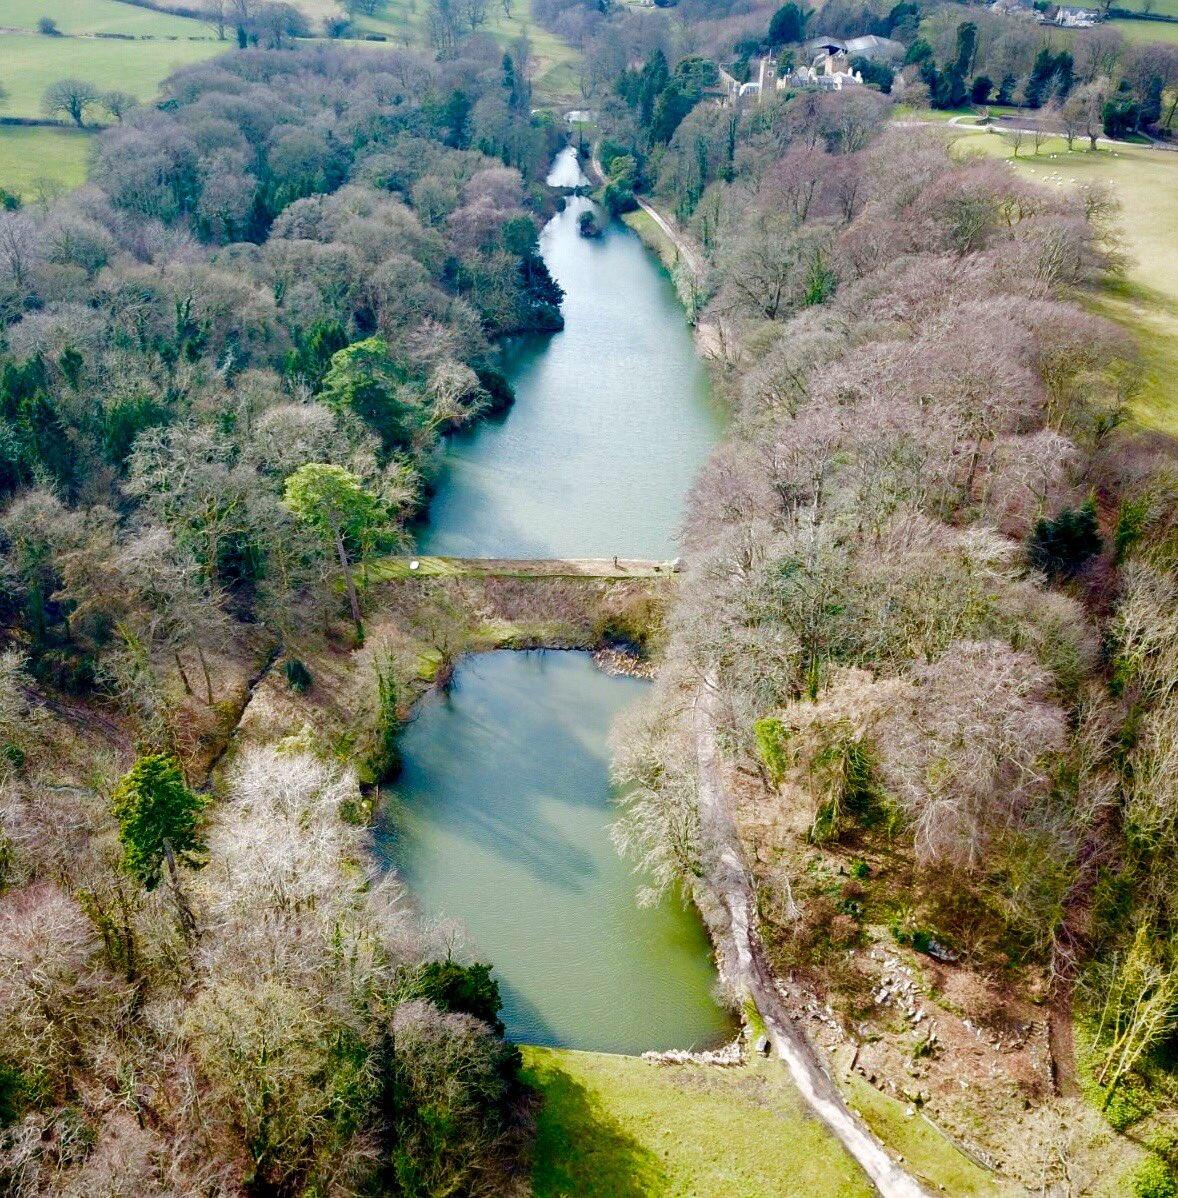 Aerial view  #Gyrn<b>Cast</b>le #carpfishing #Wales #lake #fishing #carp https://t.co/84LXHqaUdl